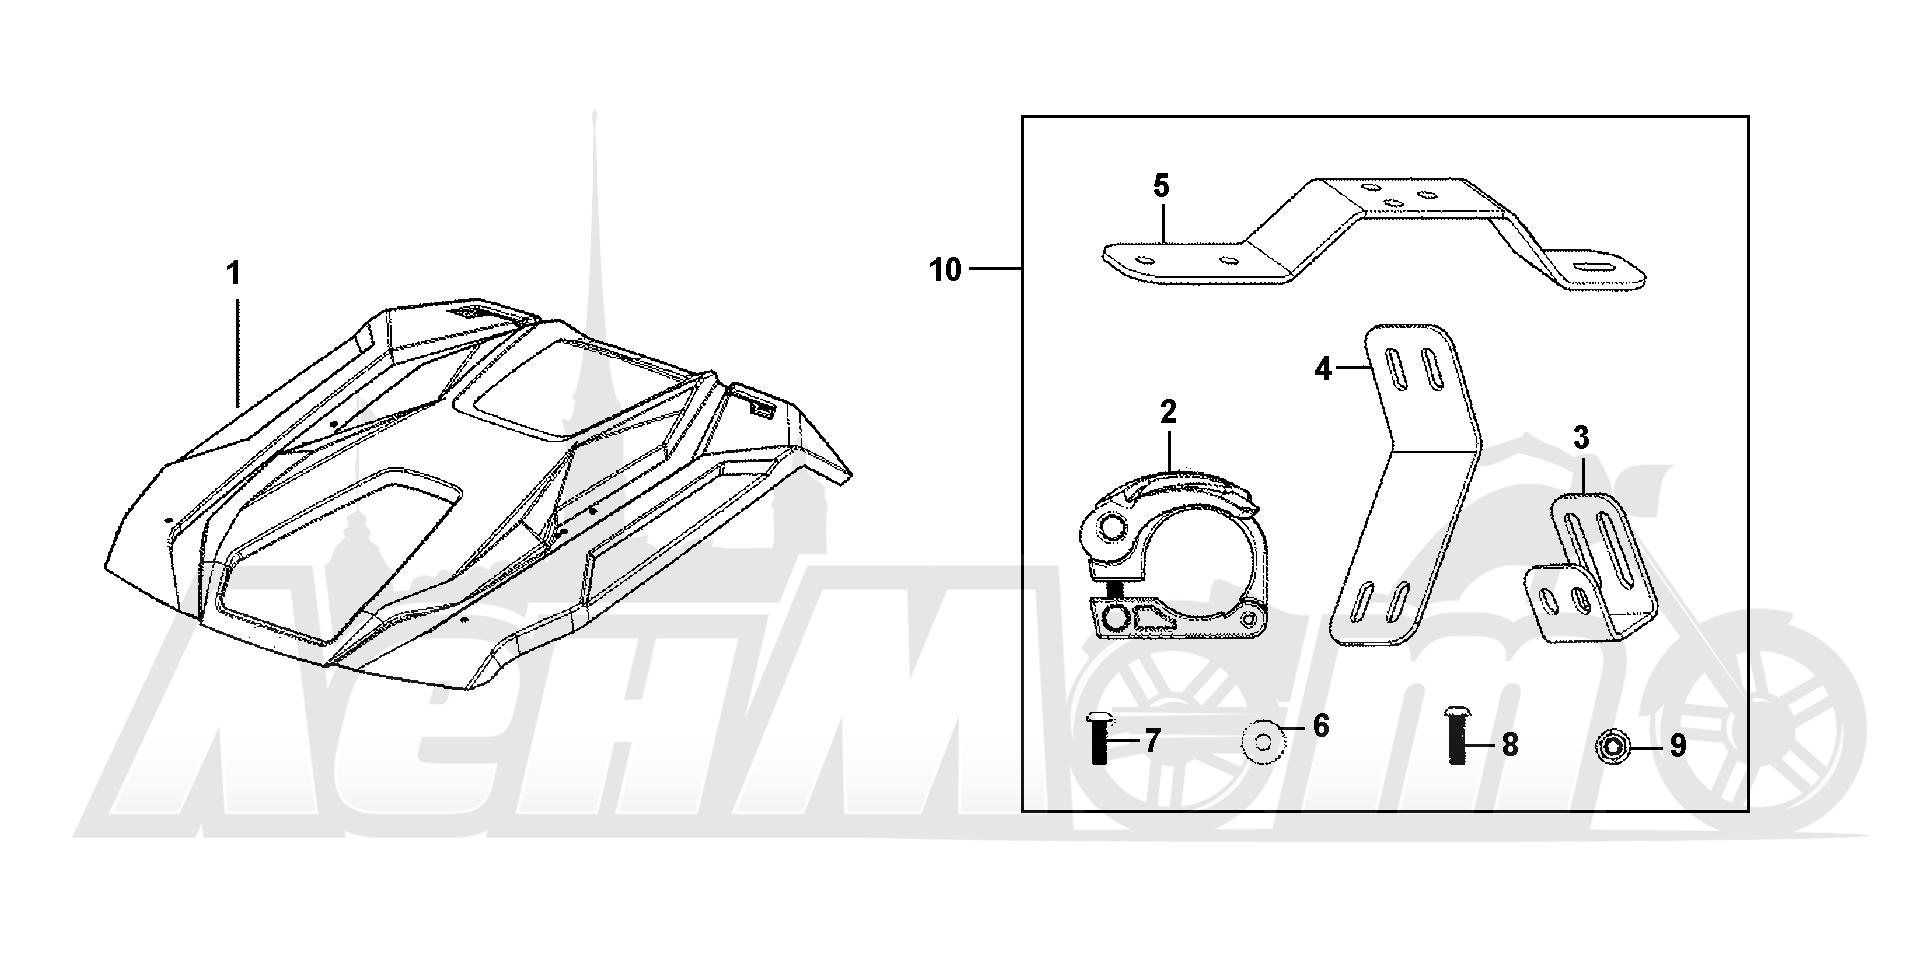 Запчасти для Квадроцикла Honda 2019 SXS1000M3P Раздел: HARD ROOF (5P) | HARD крыша (5P)